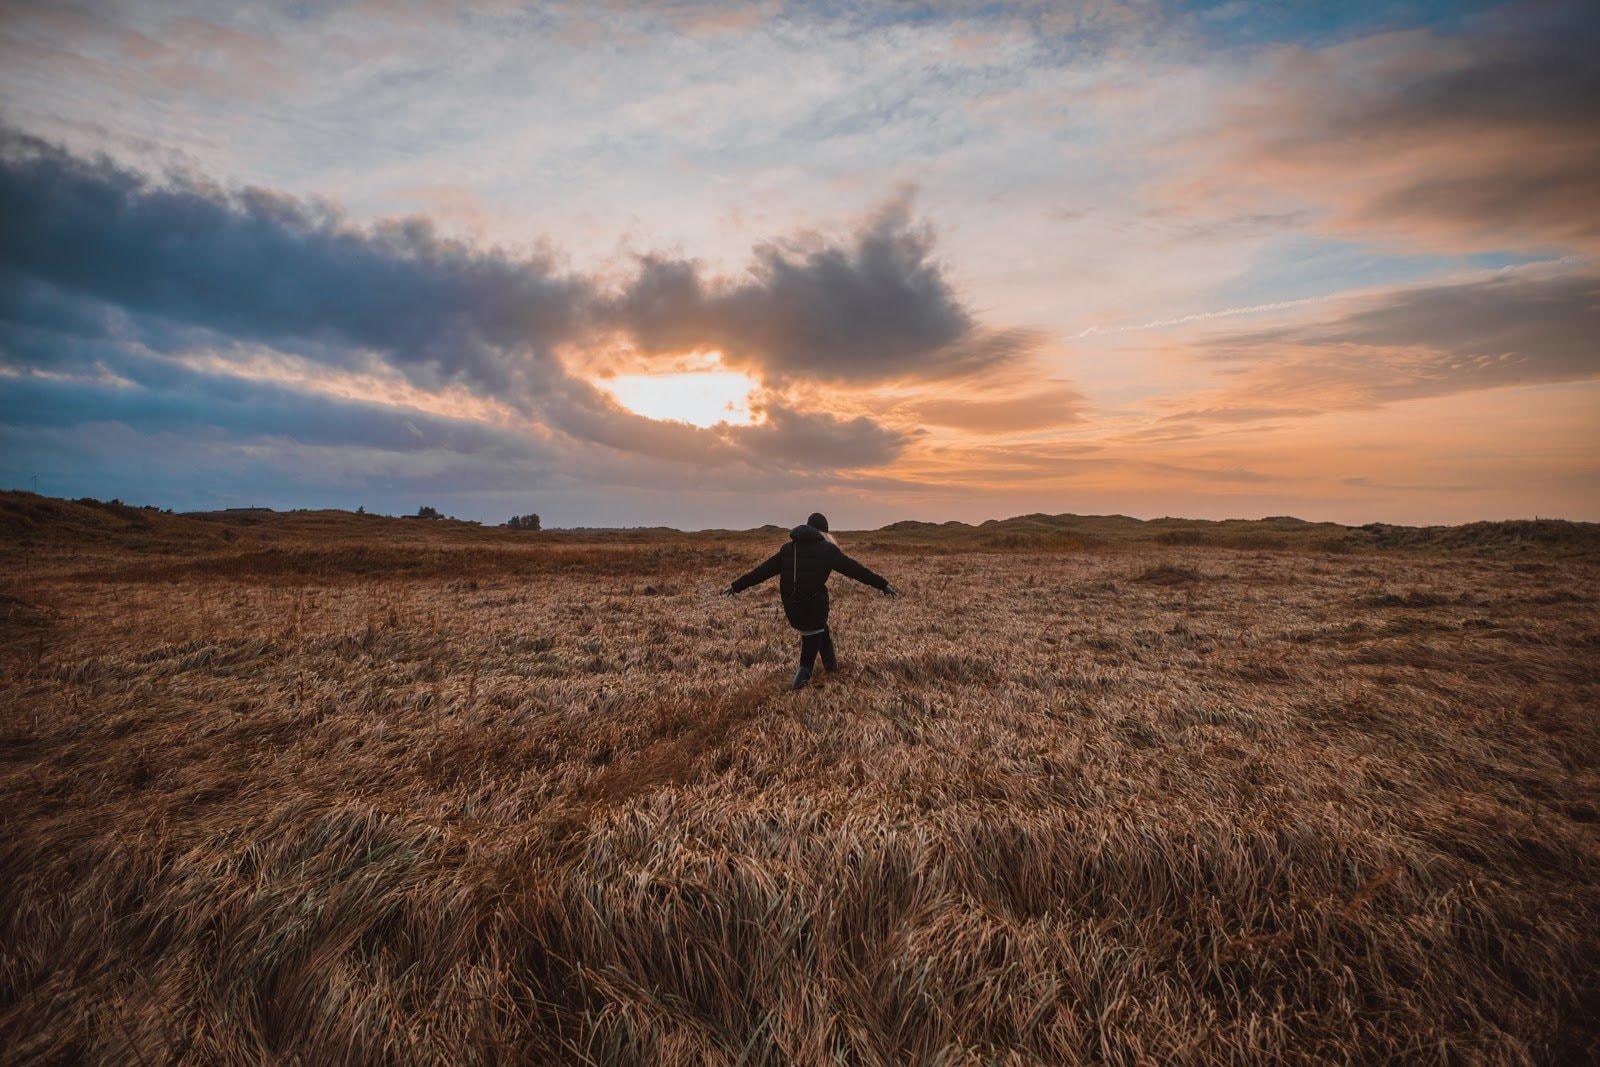 Person walking in a field during the golden hour by Soren Astrup Jorgensen